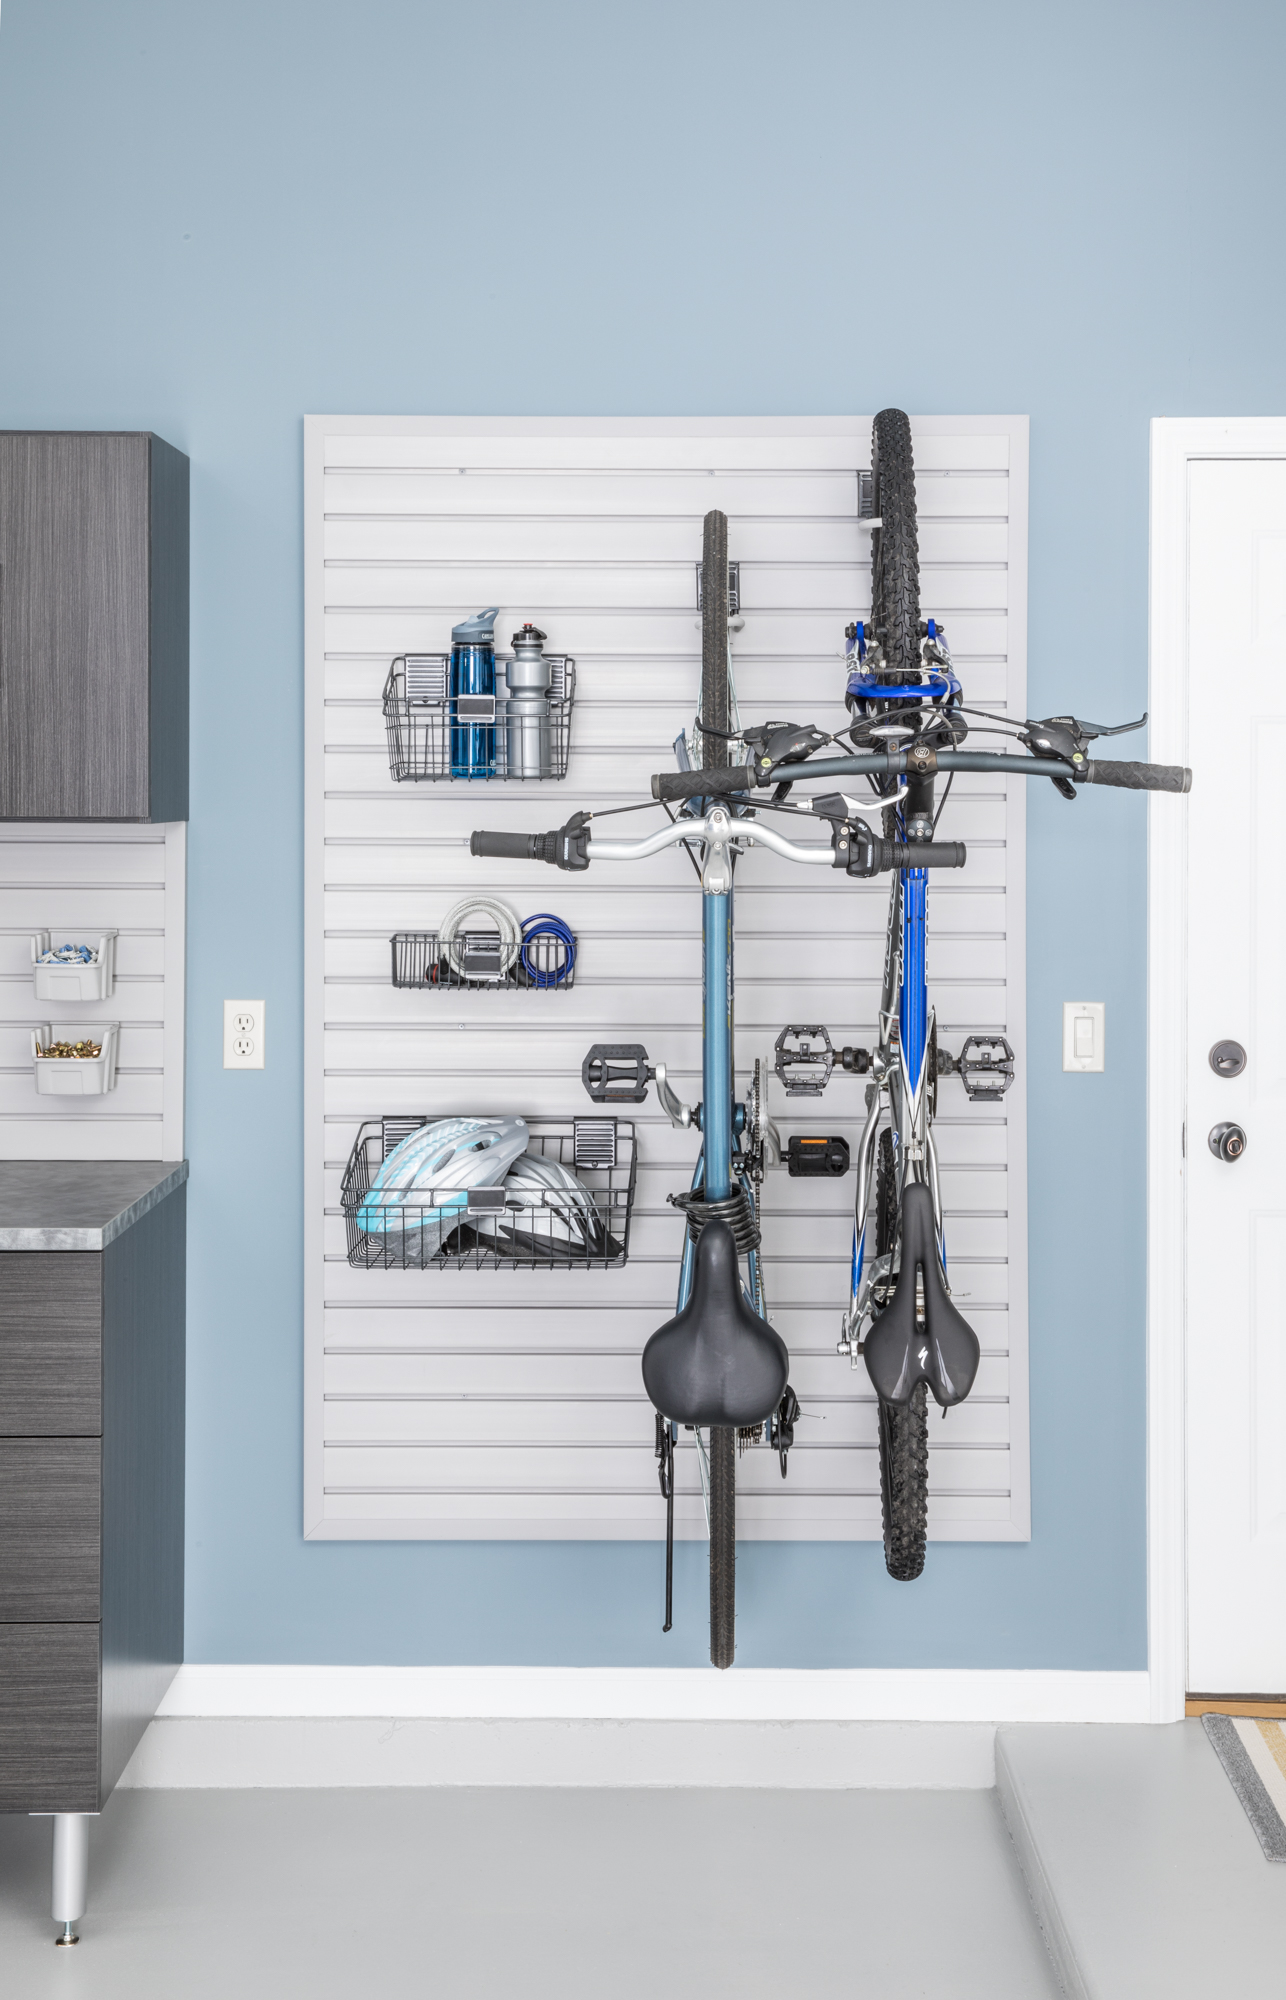 Essential Elements of an Organized Garage